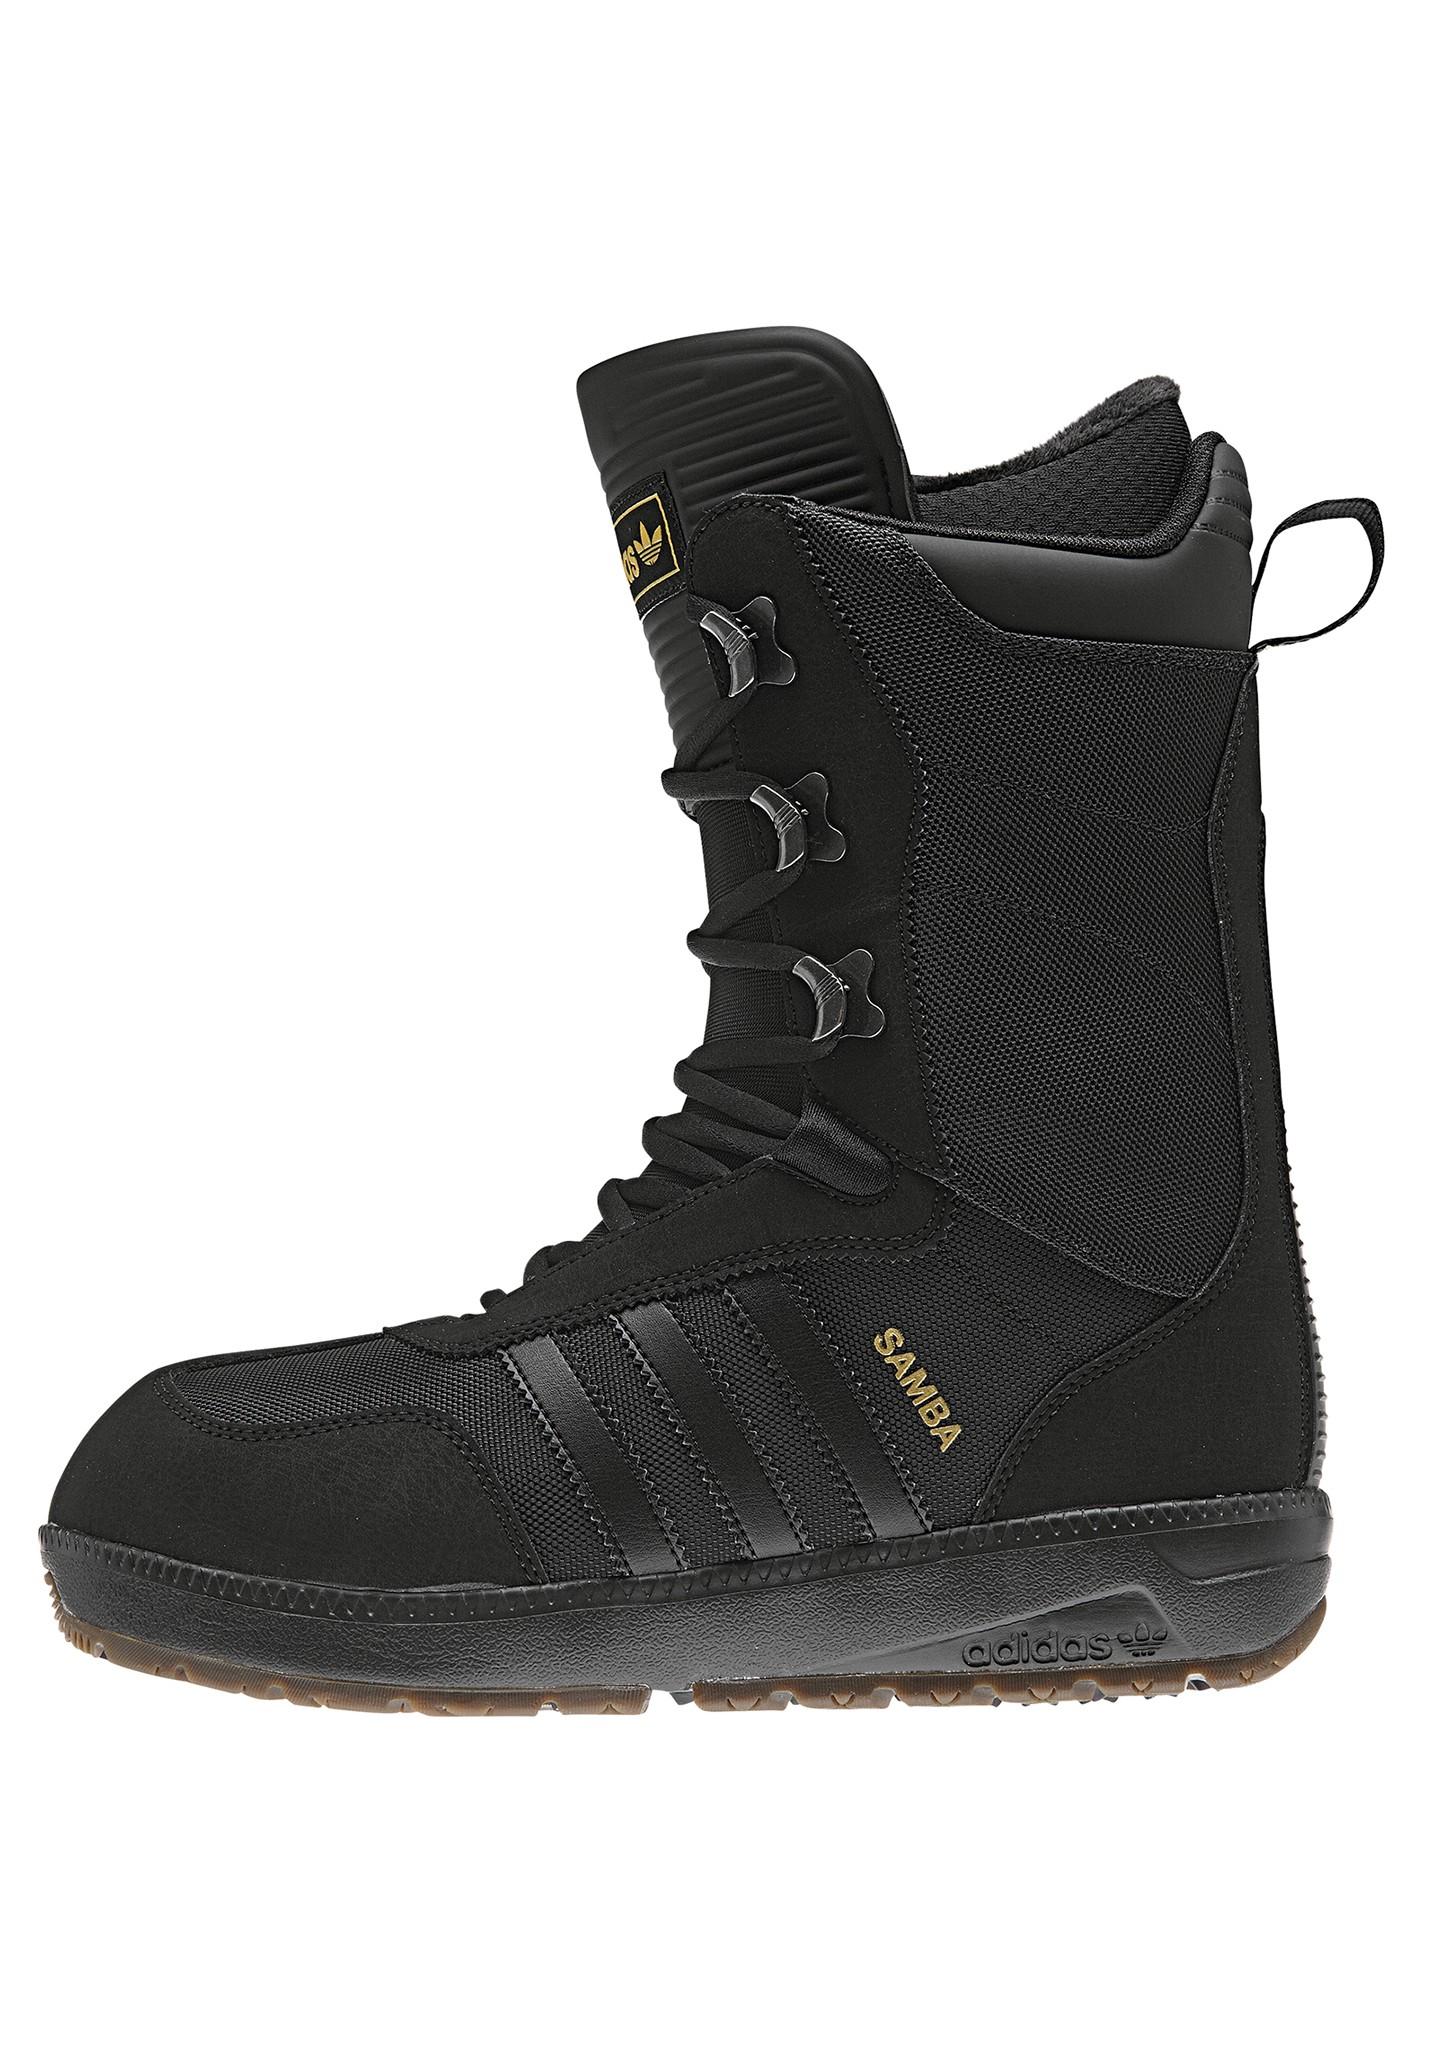 neu adidas the samba herren snowboard boots snow schuhe stiefel ebay. Black Bedroom Furniture Sets. Home Design Ideas